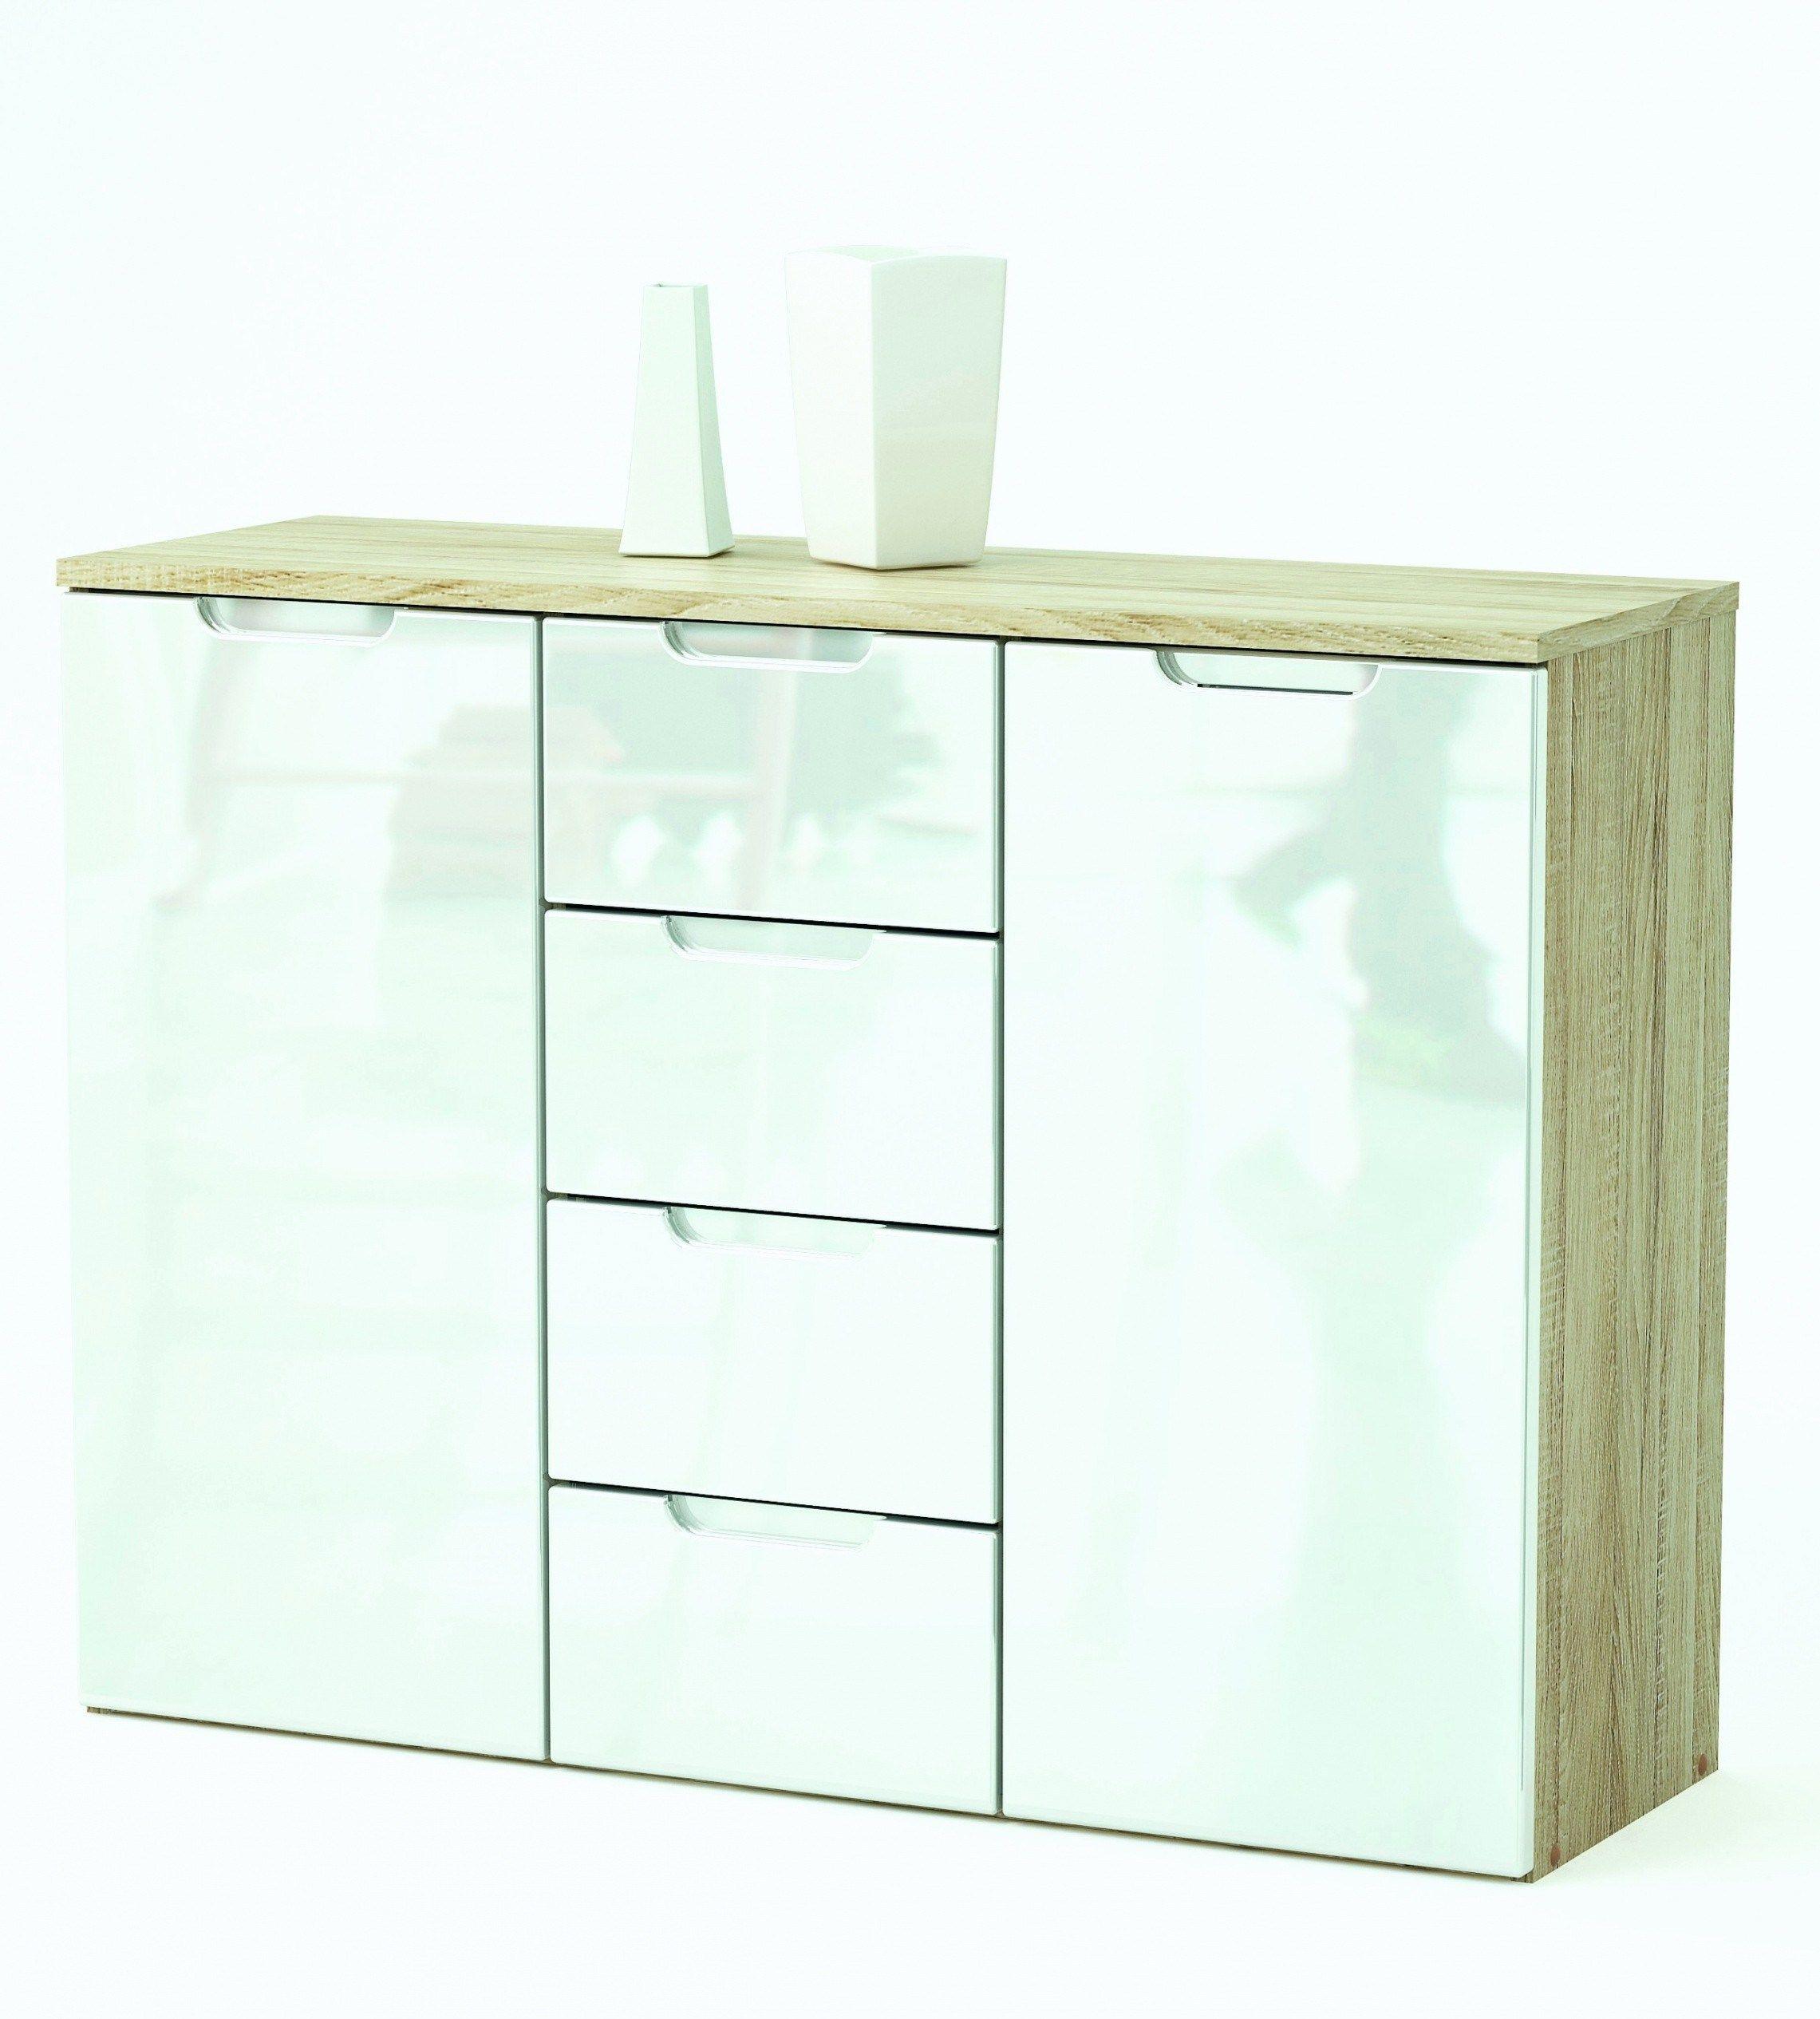 Best Of Meuble Trieur Bureau Drawers Sideboard Ikea